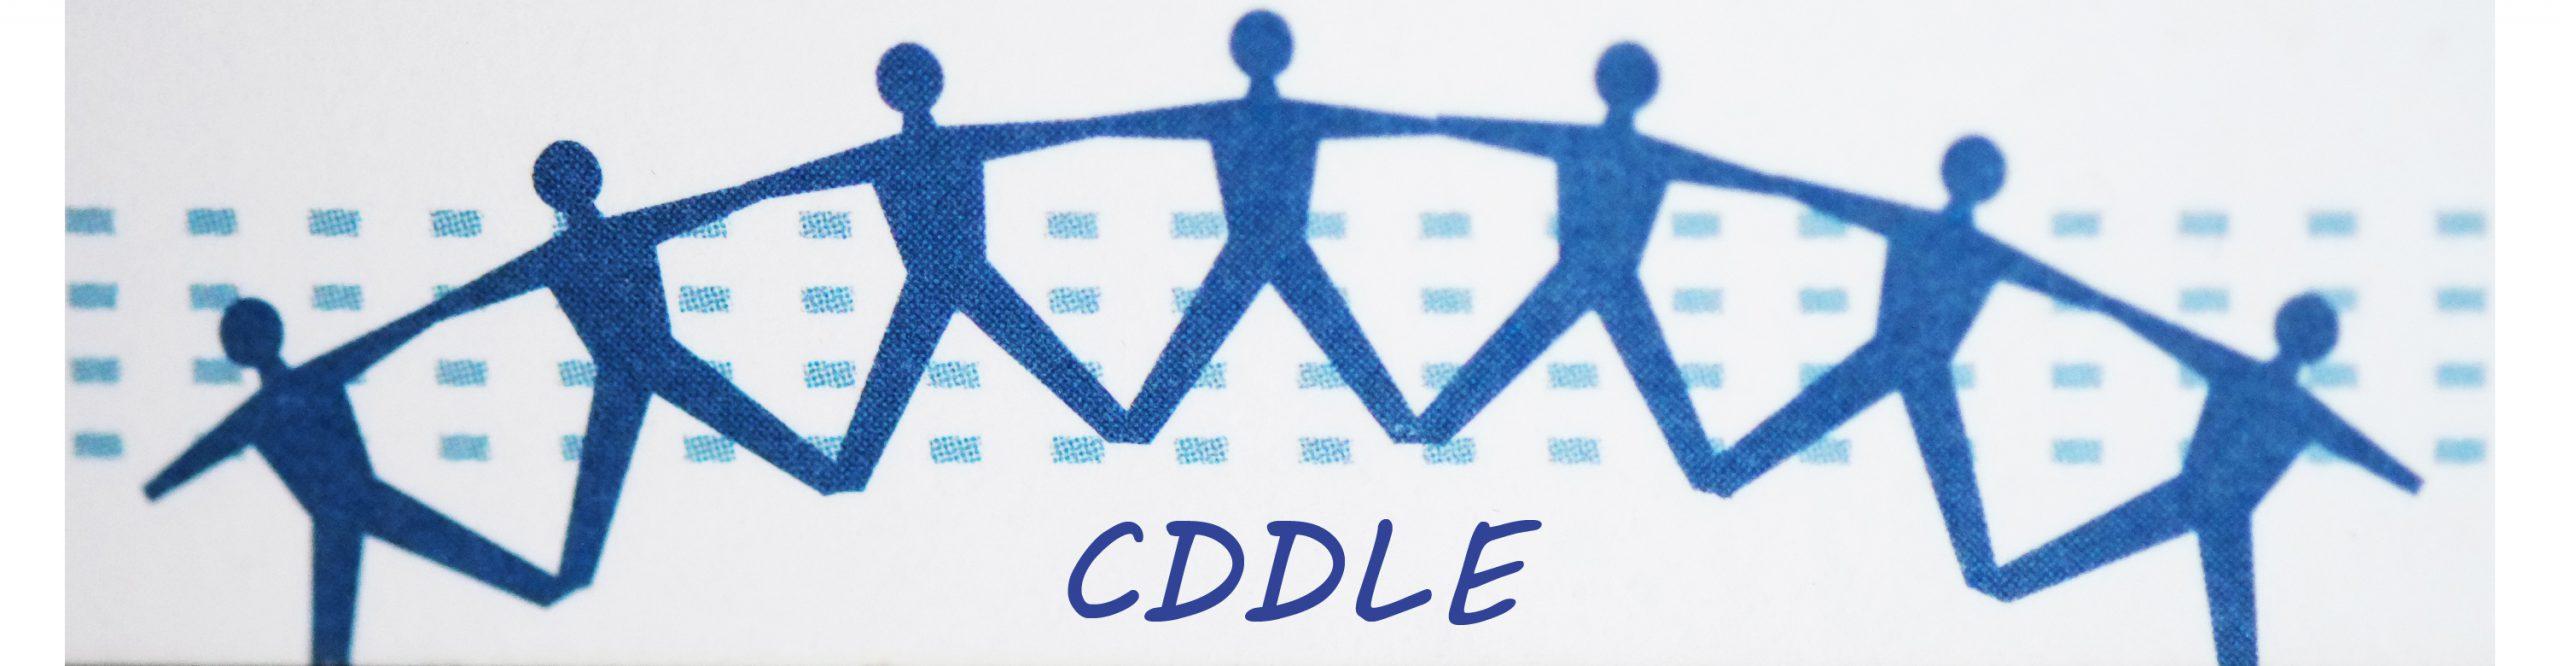 cddle32